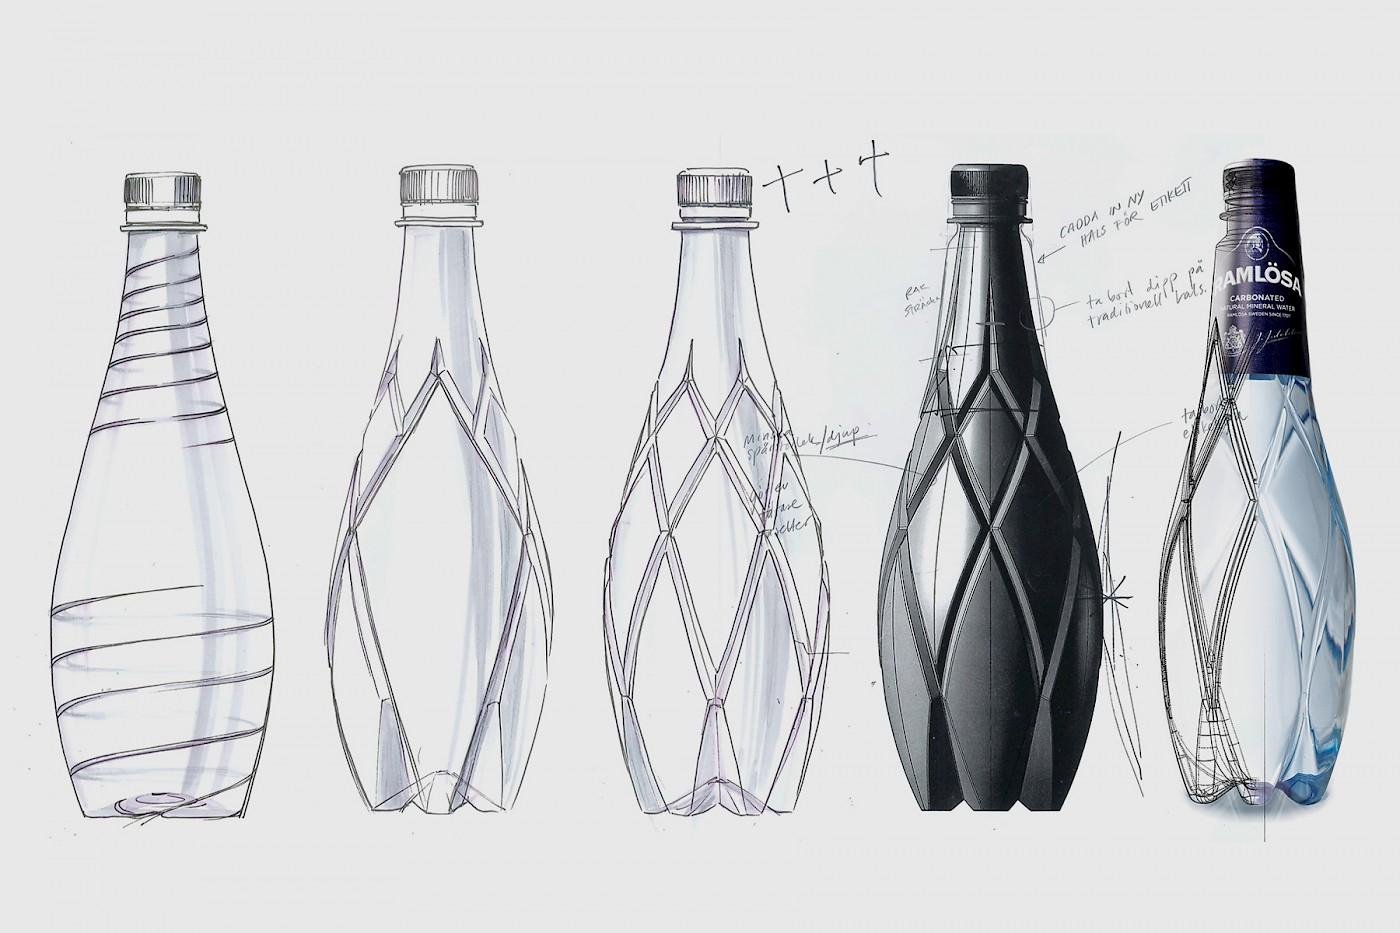 02-nine-ramlosa-process-bottle_copy.1400x0.jpg